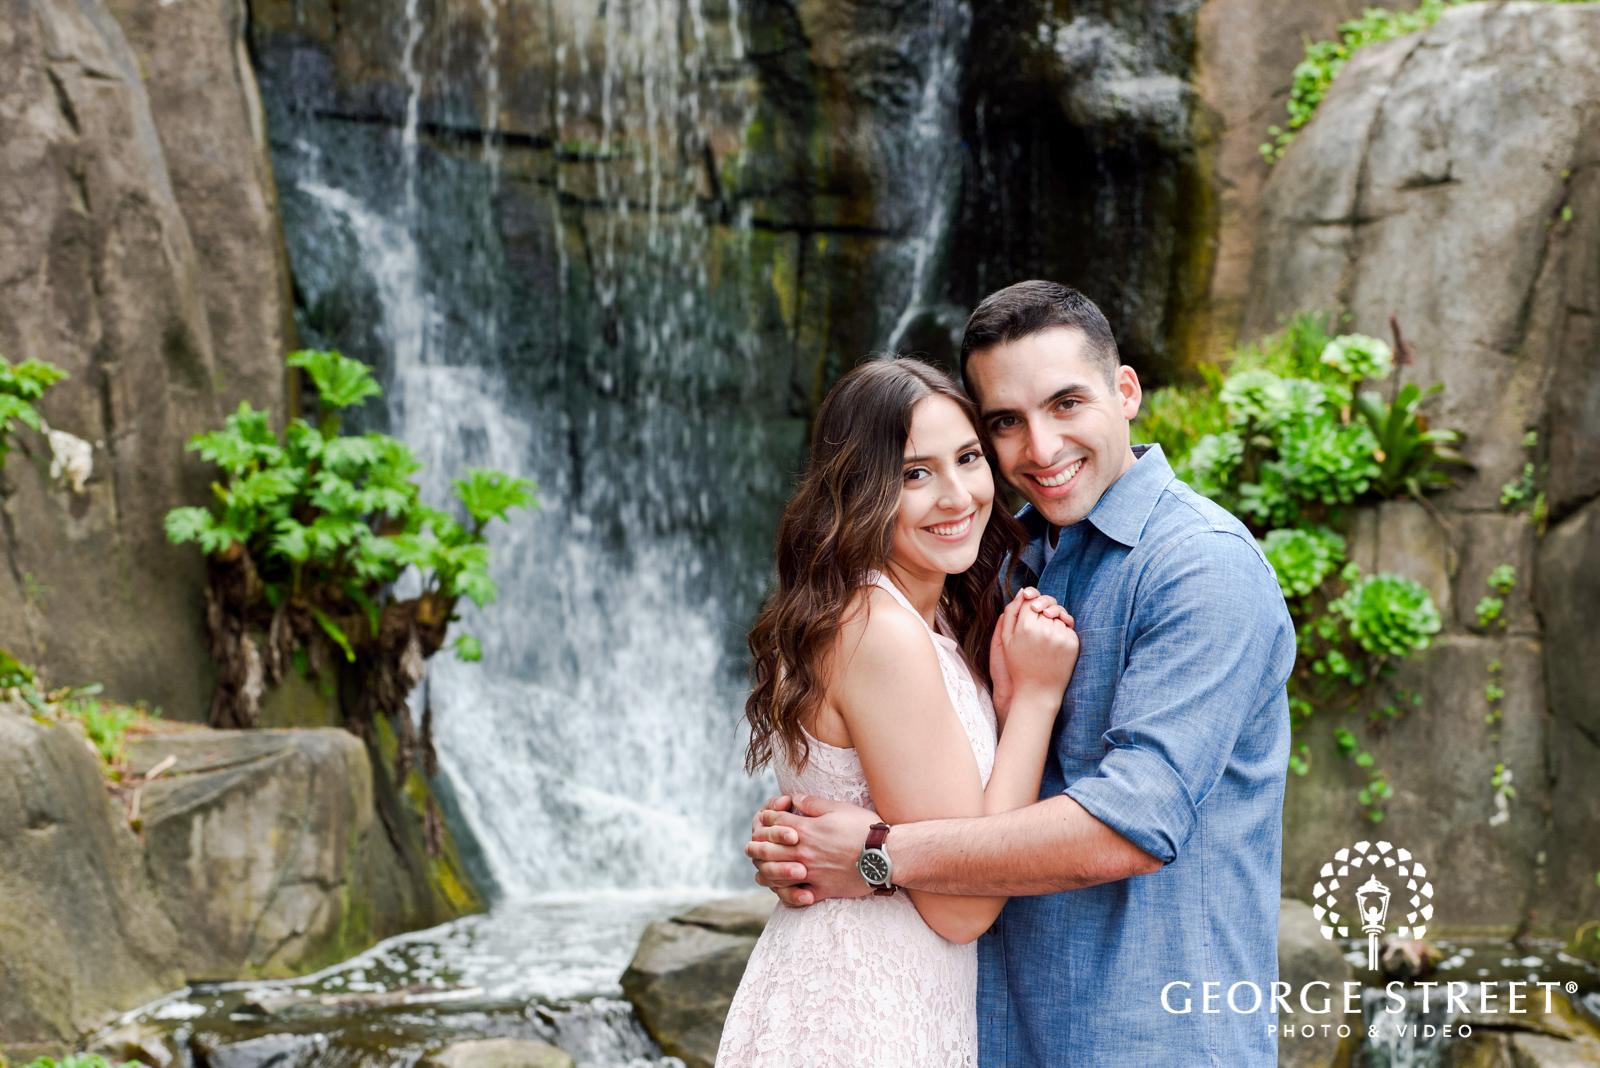 gorgeous outdoor engagement portrait at golden gate state park 2